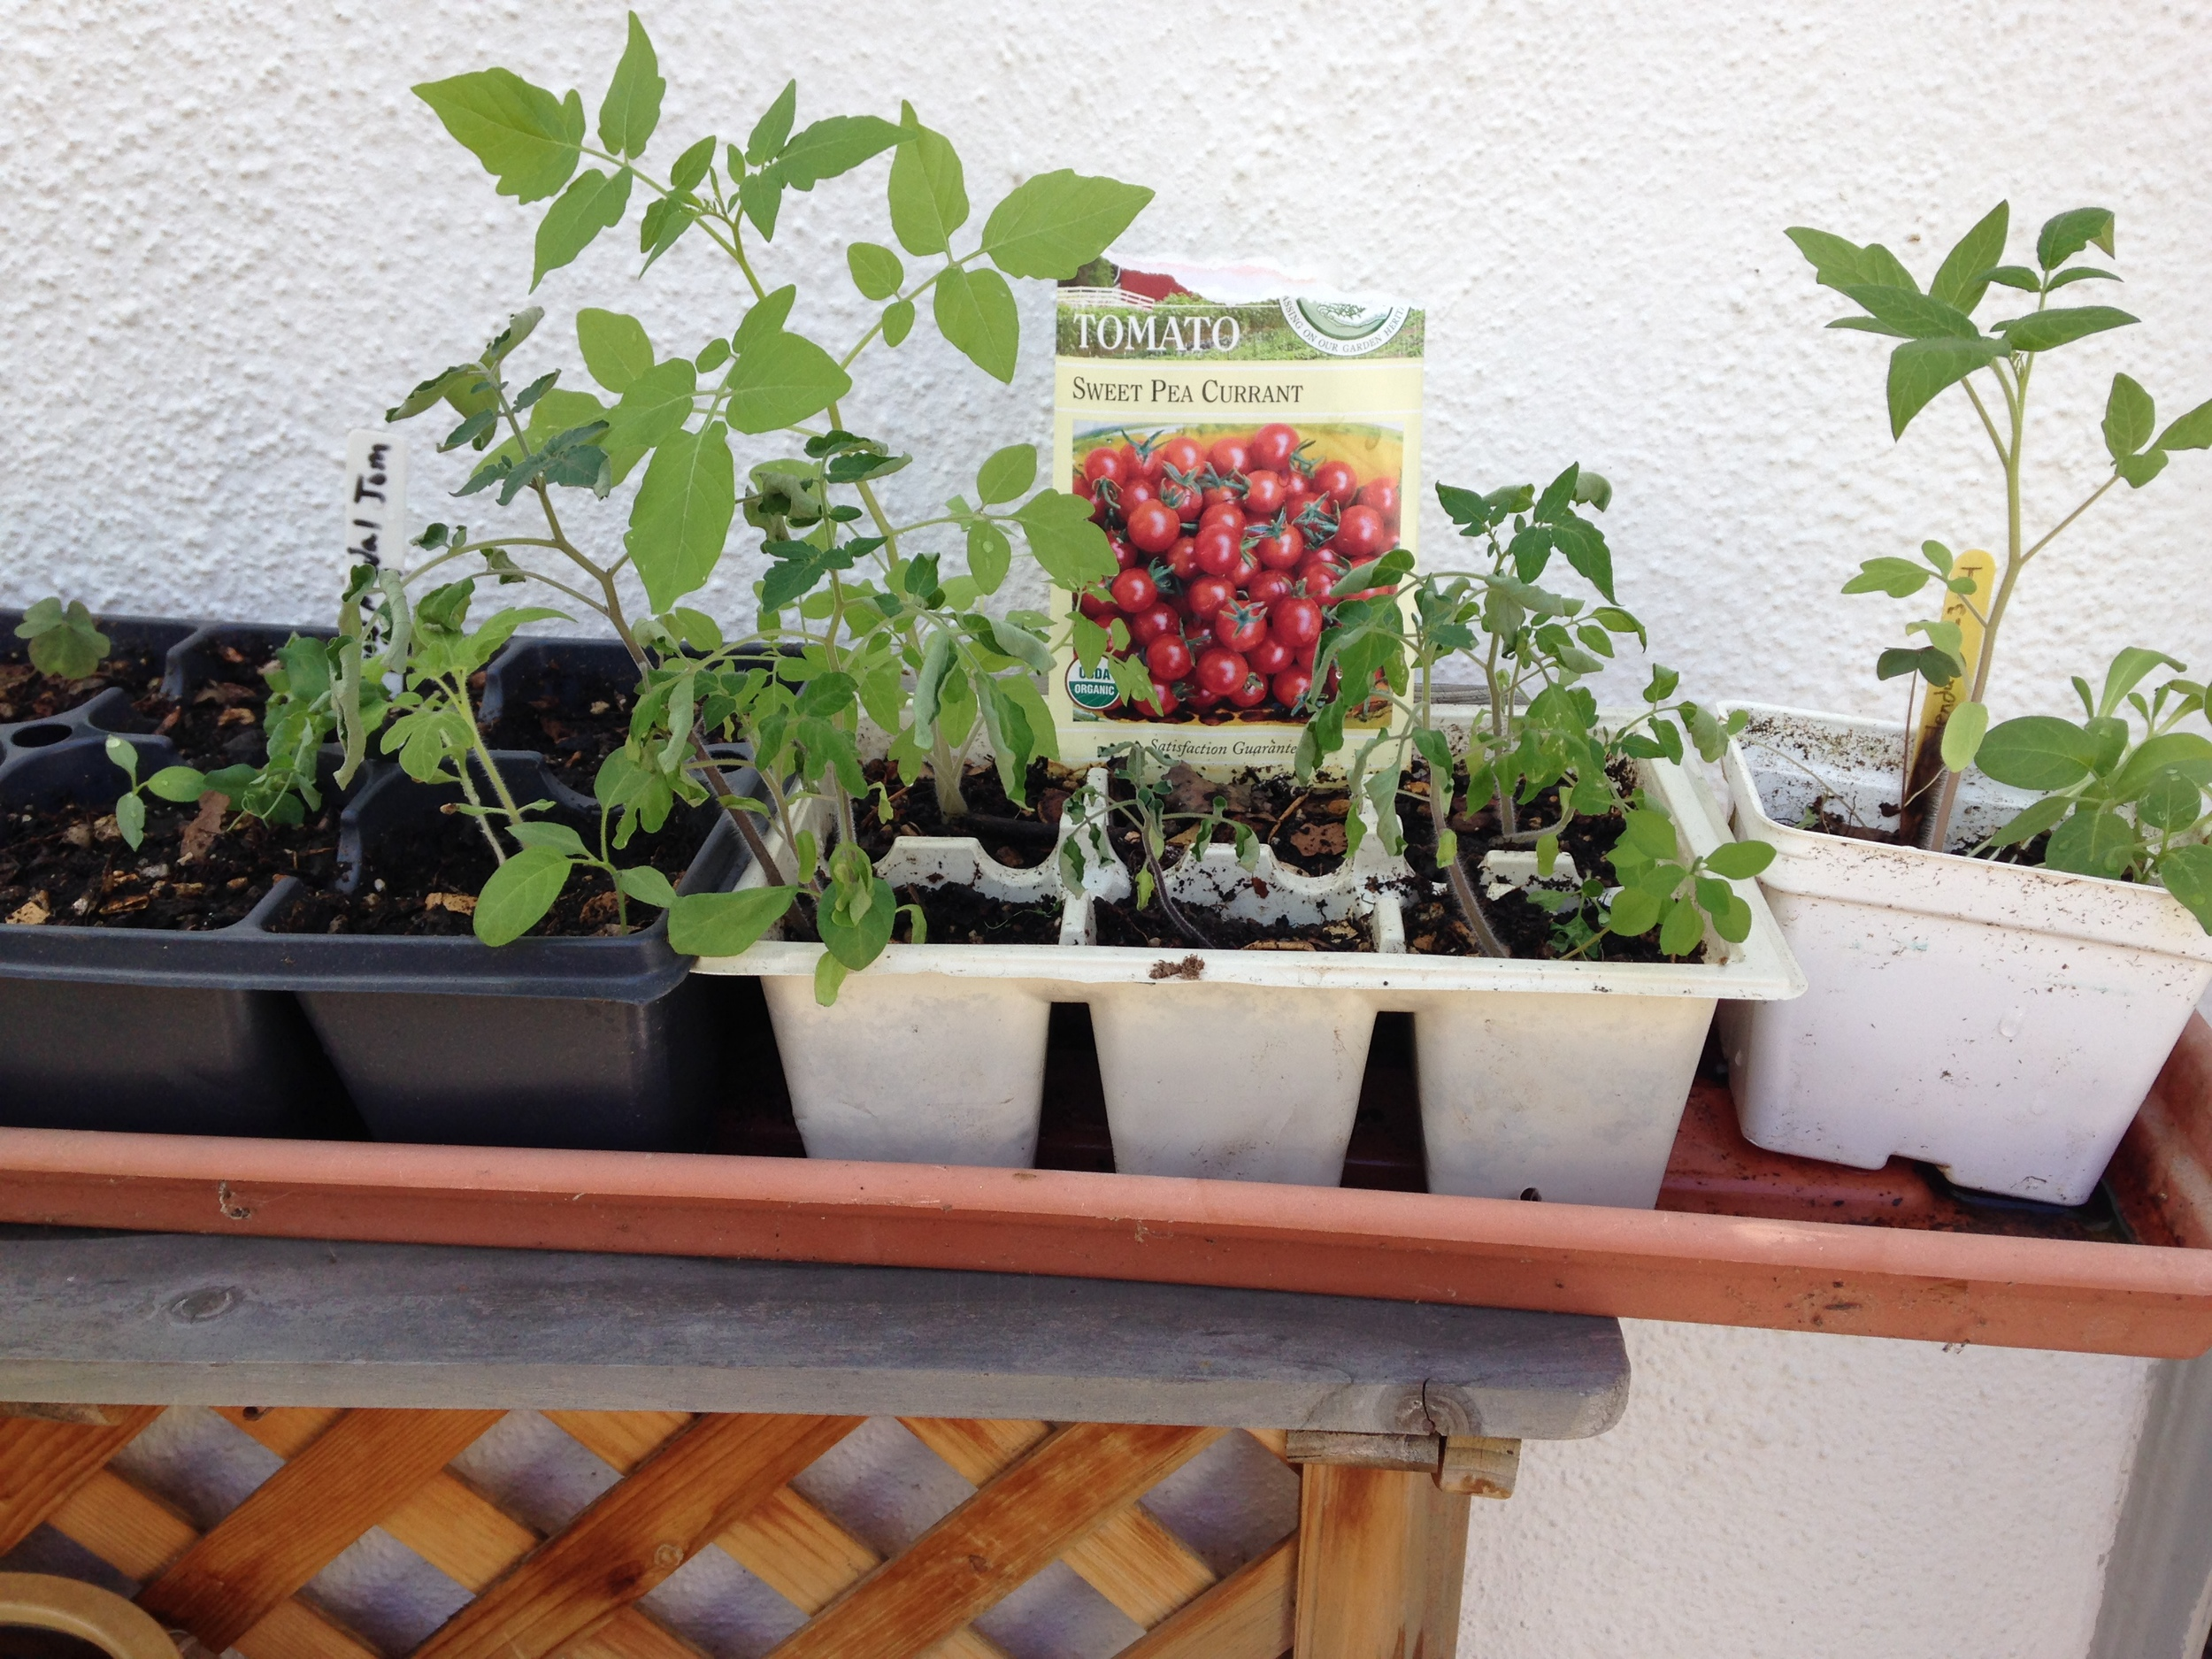 Tomato, pea and Calendula seedlings hardening off outdoors.